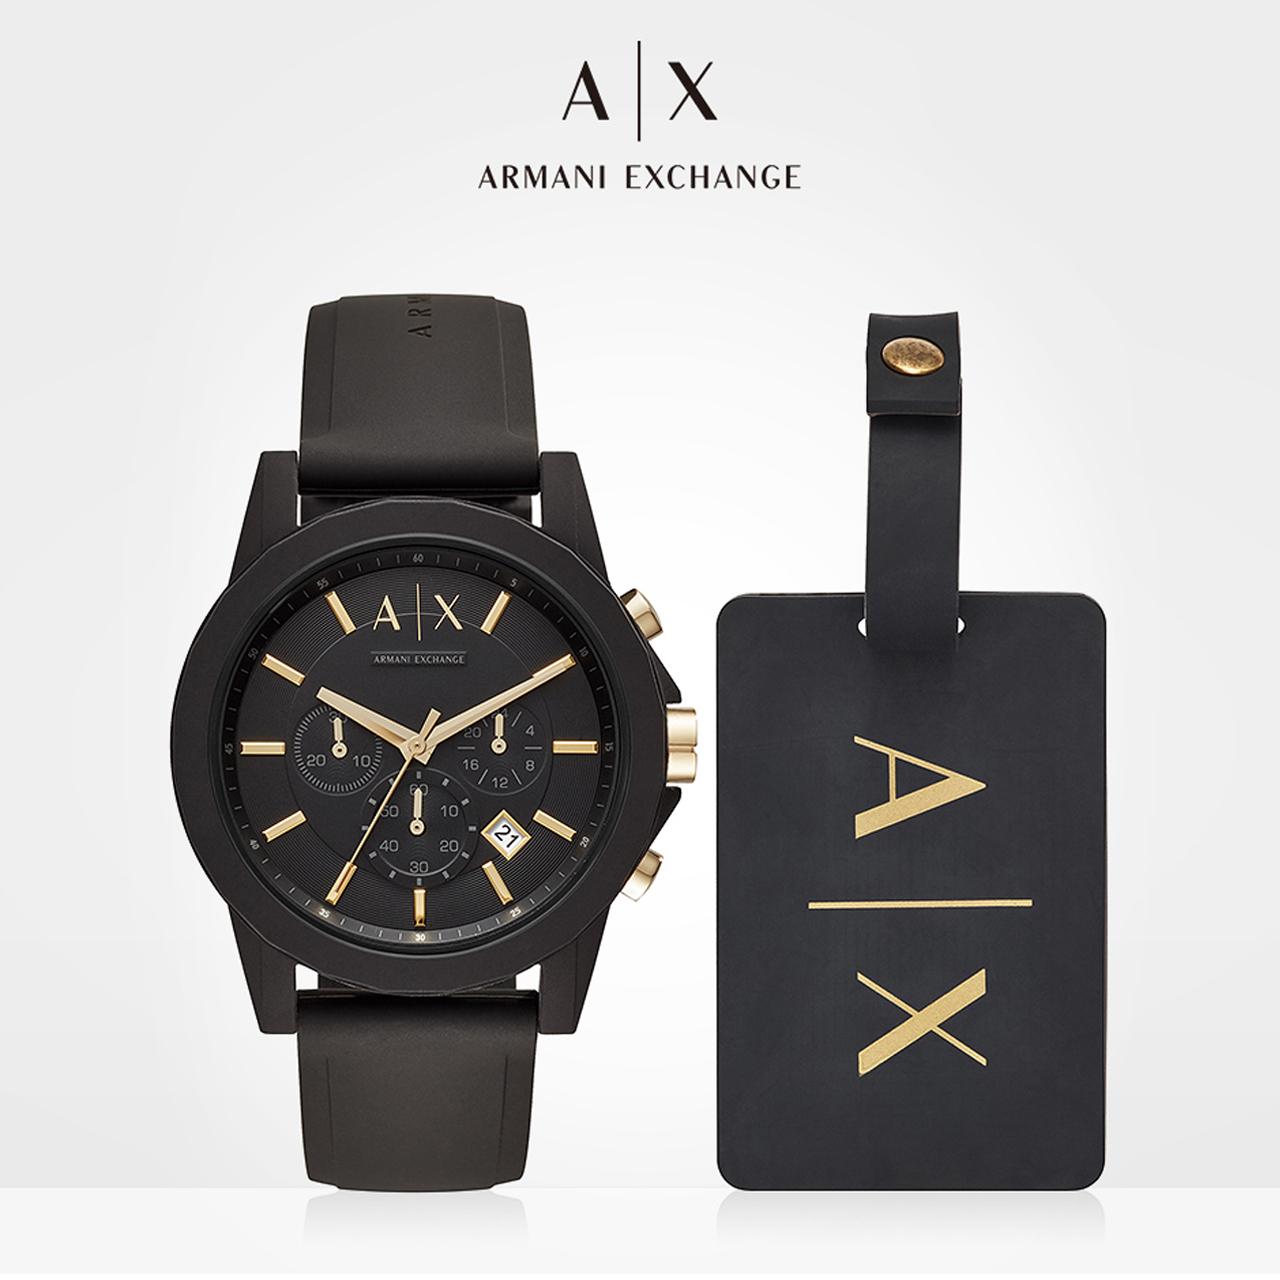 Armani阿玛尼官方旗舰店正品男士手表小黑盒黑武士十大品牌AX7105